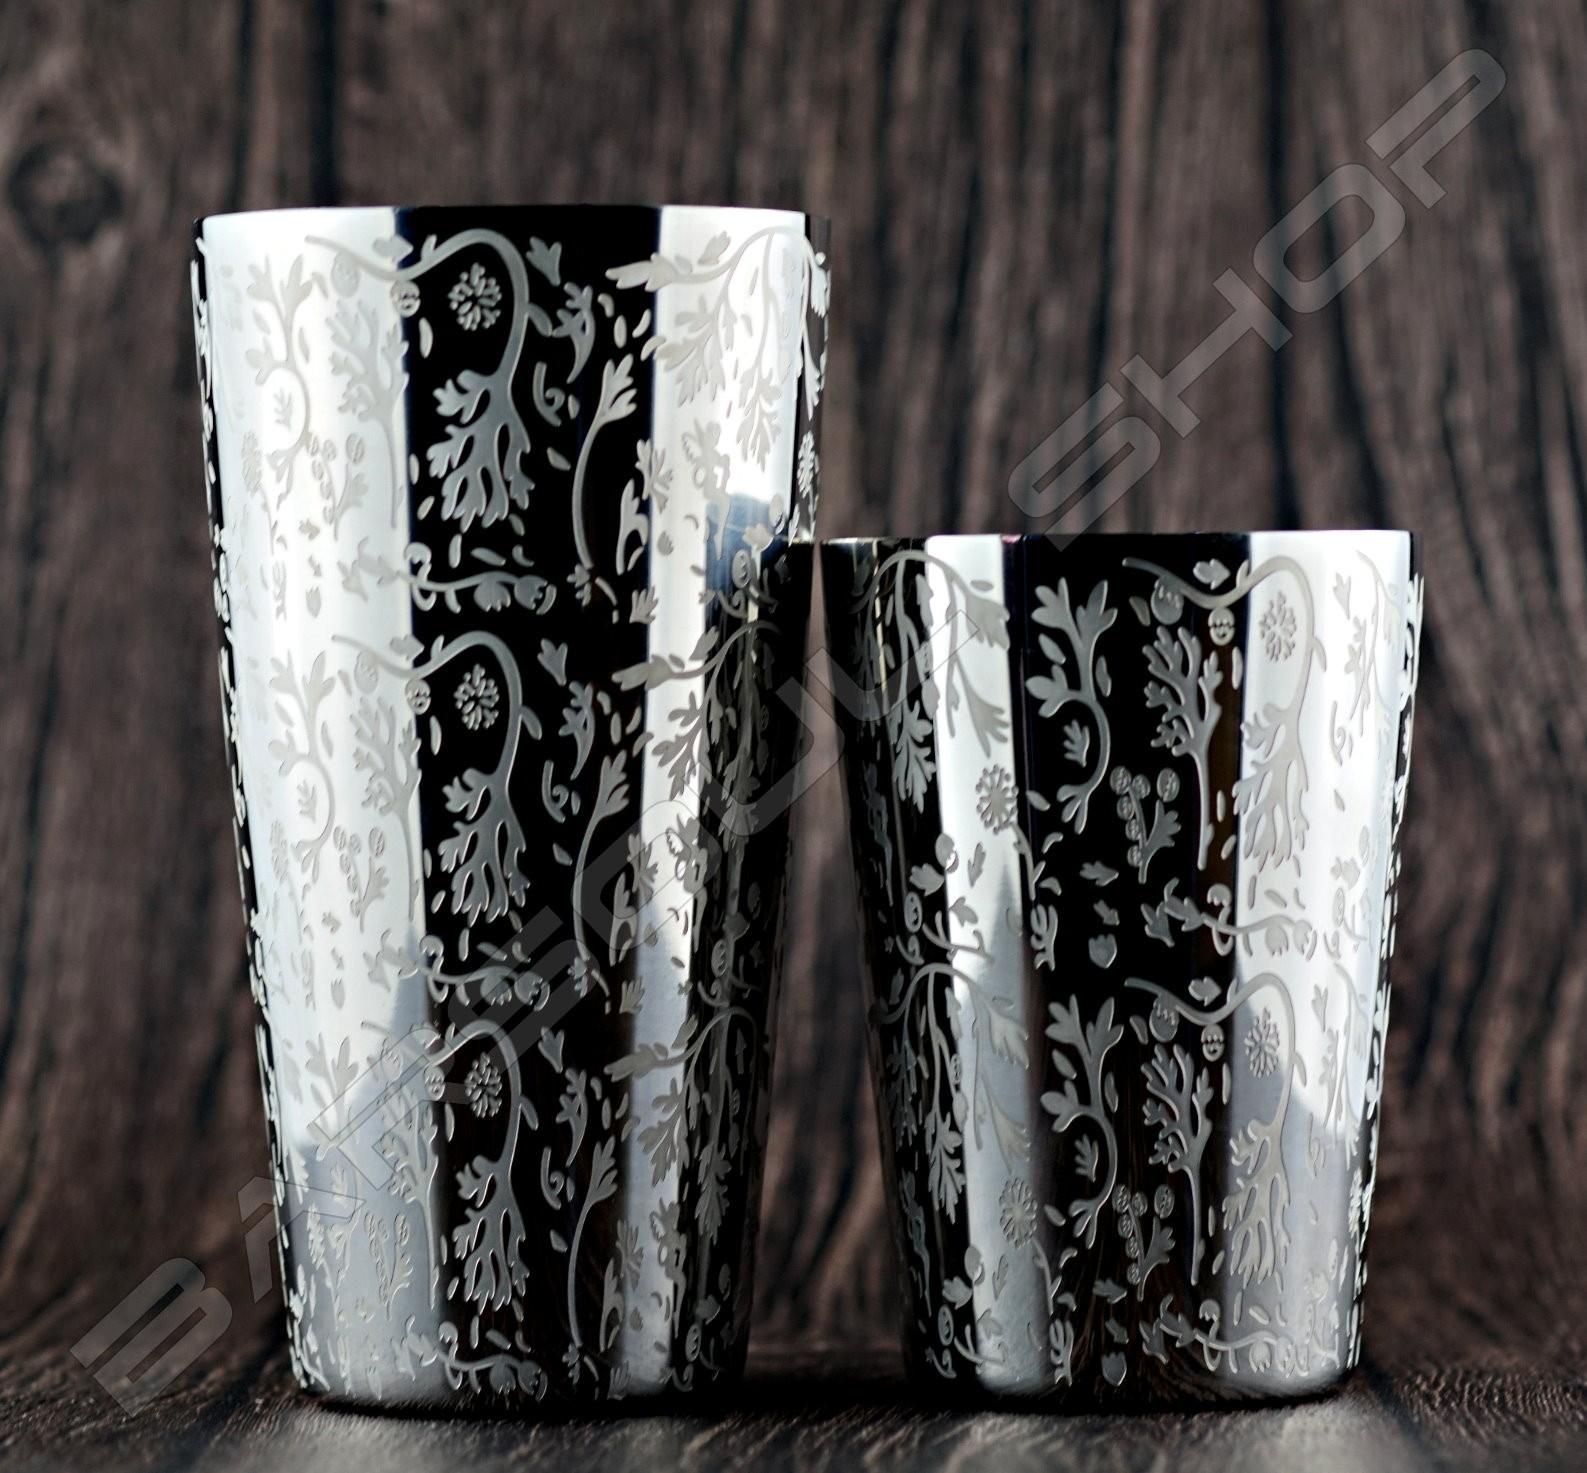 二節式雕花波士頓shaker組(銀) Boston shaker set(silver)